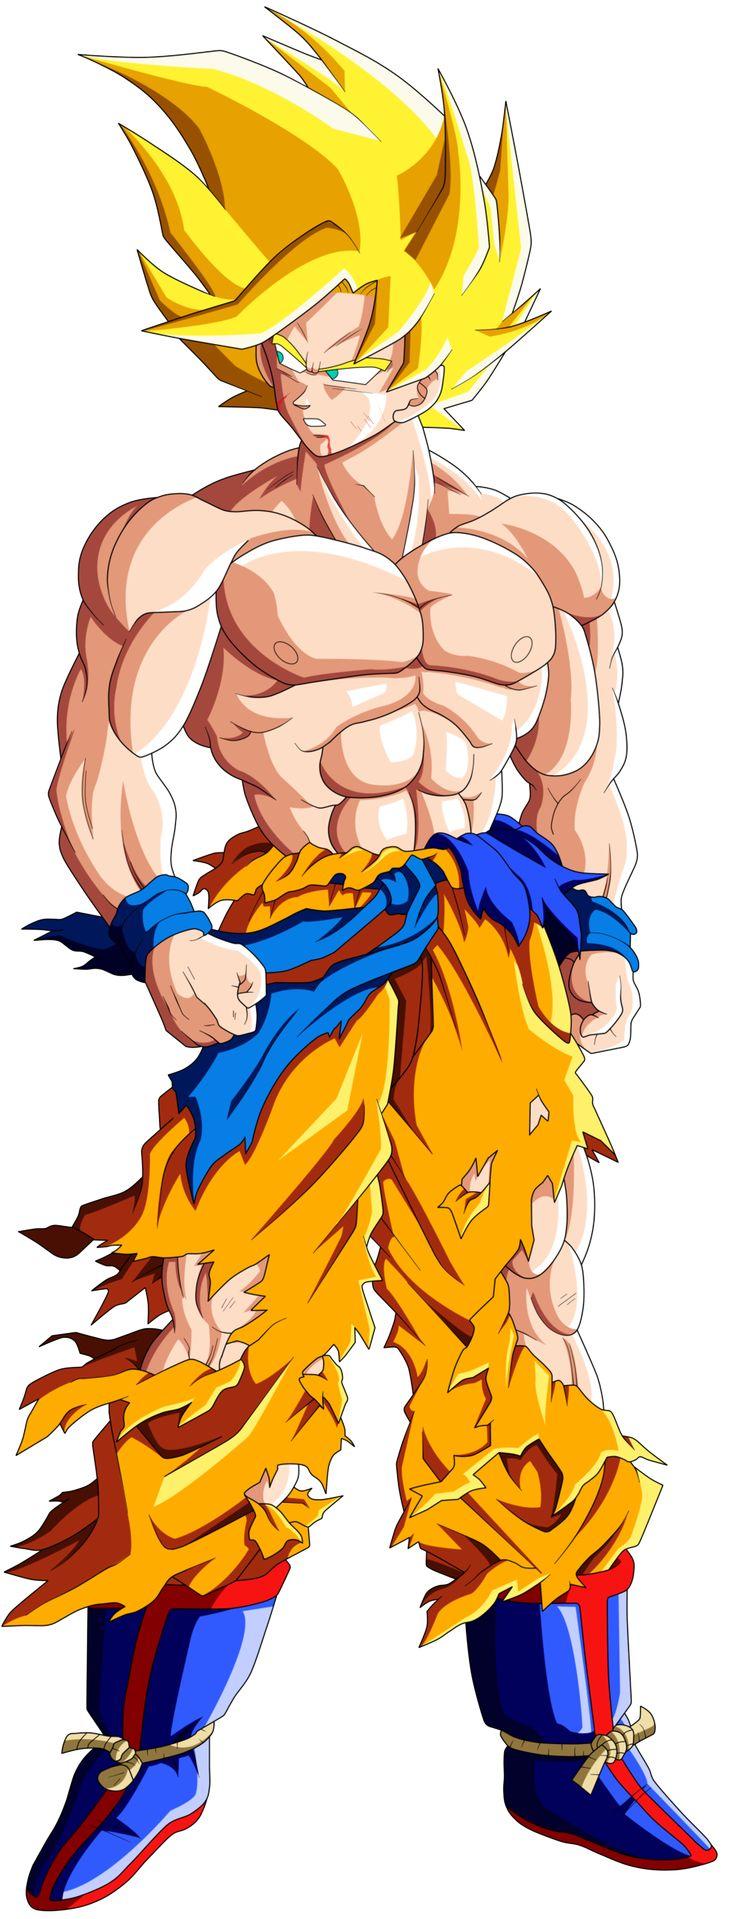 Estado Base. Ozaru. Super Saiyajin Falso. Super Saiyajin. Super Saiyajin Ascendido. Ultra Super Saiyajin. Super Saiyajin 2. Super Saiyajin 3. Super Saiyajin Dios. Super Saiyajin Dios...